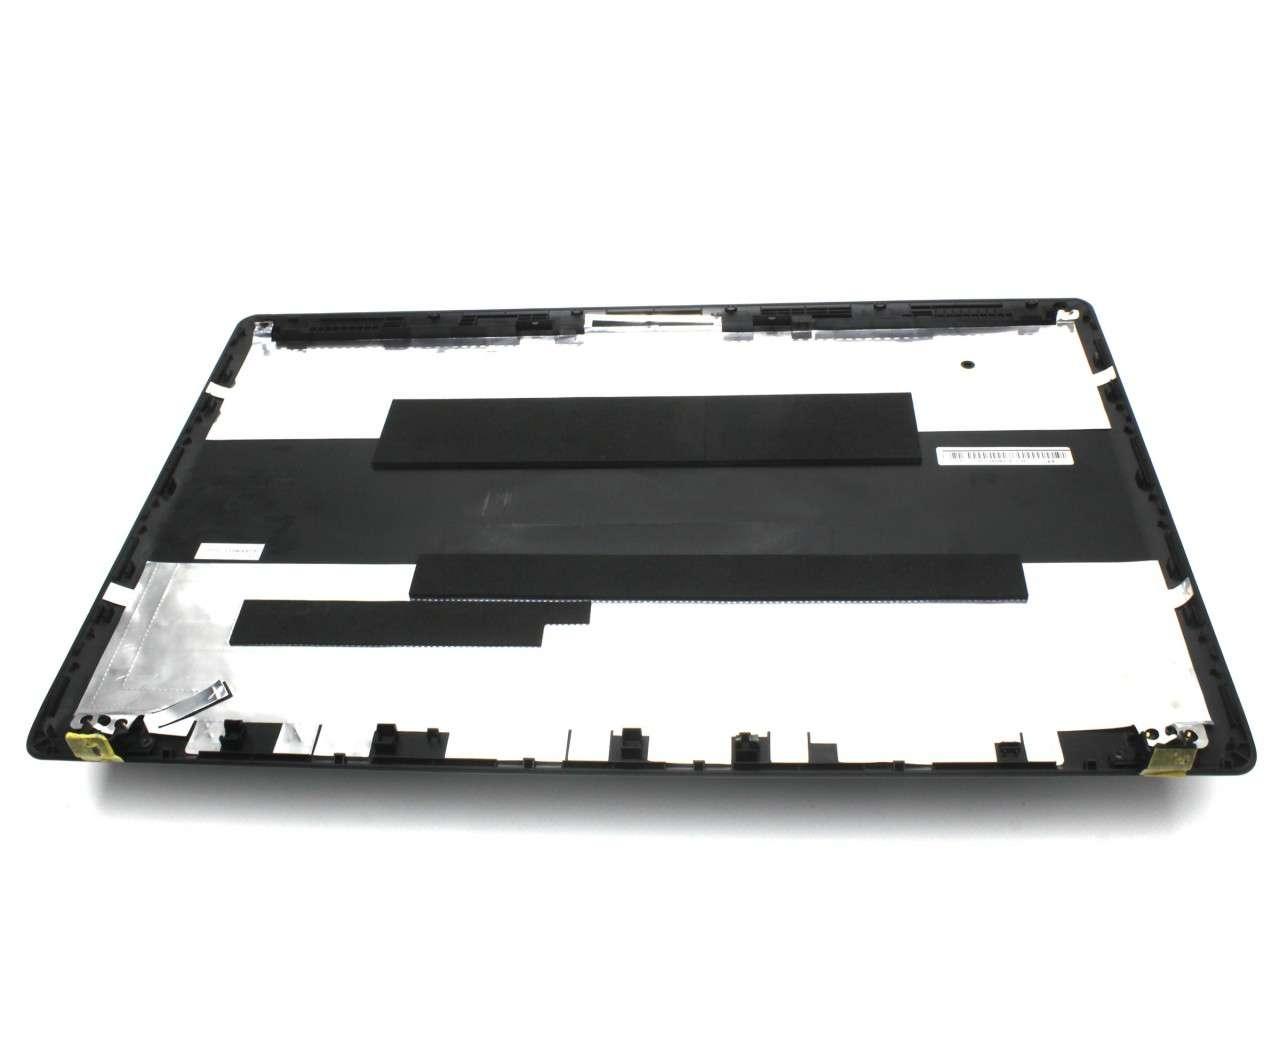 Capac Display BackCover IBM Lenovo G570 Carcasa Display Neagra imagine powerlaptop.ro 2021